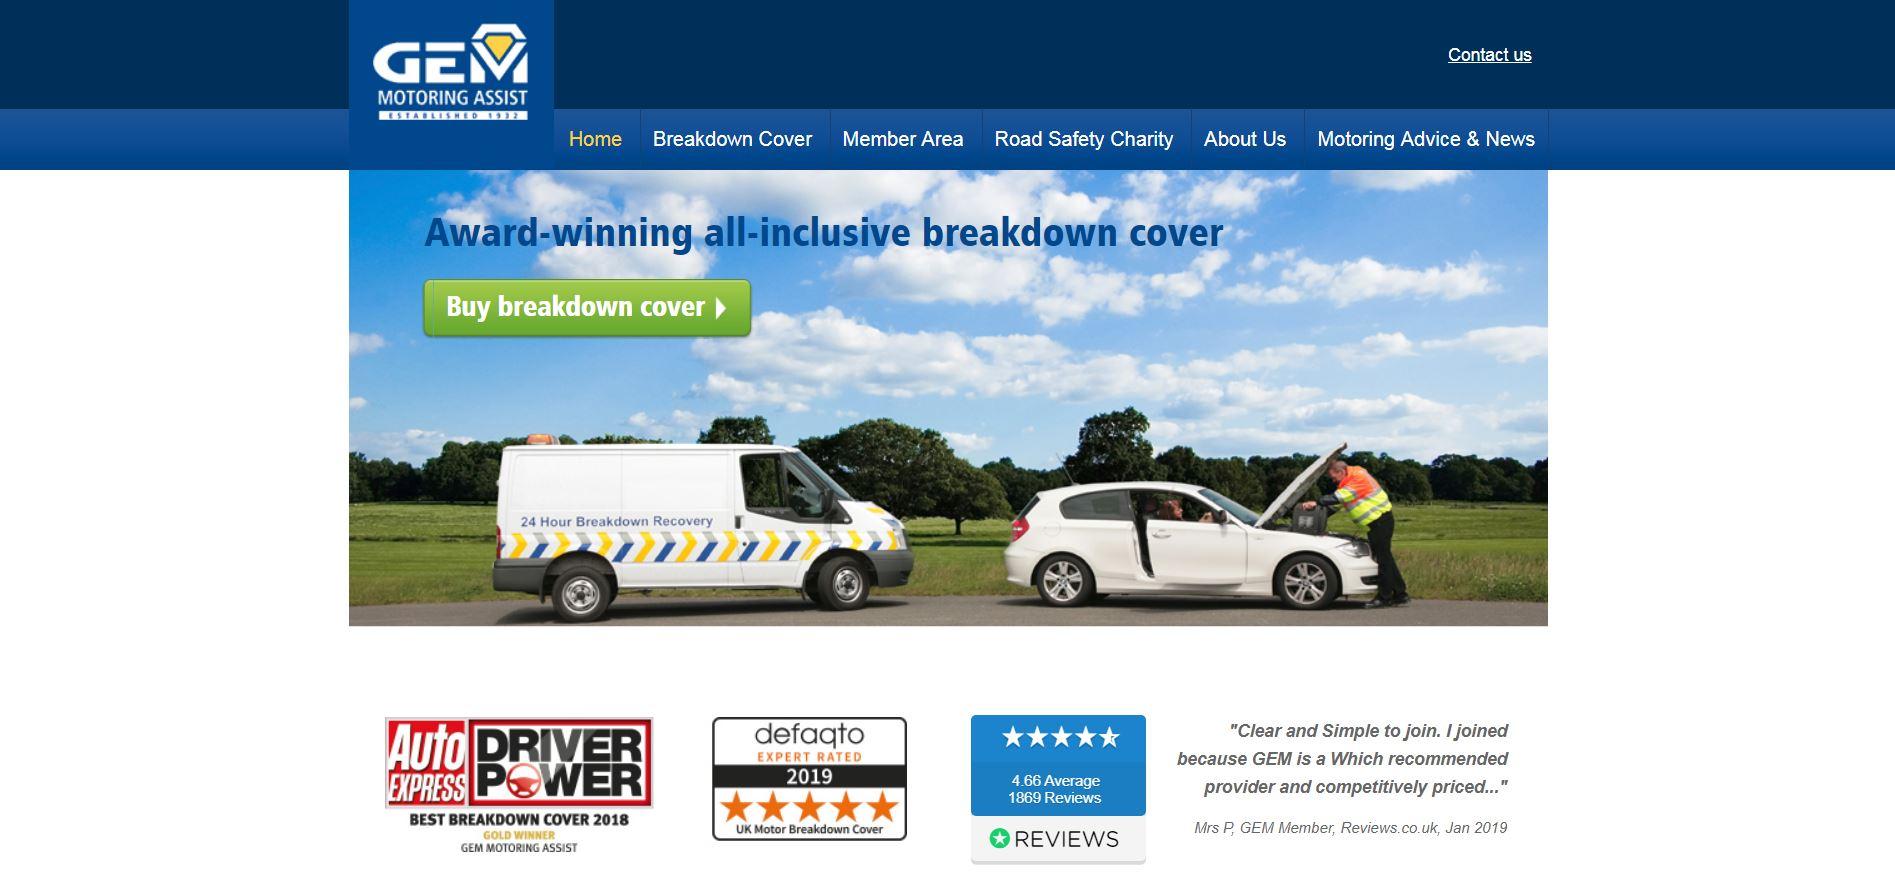 GEM's website home page